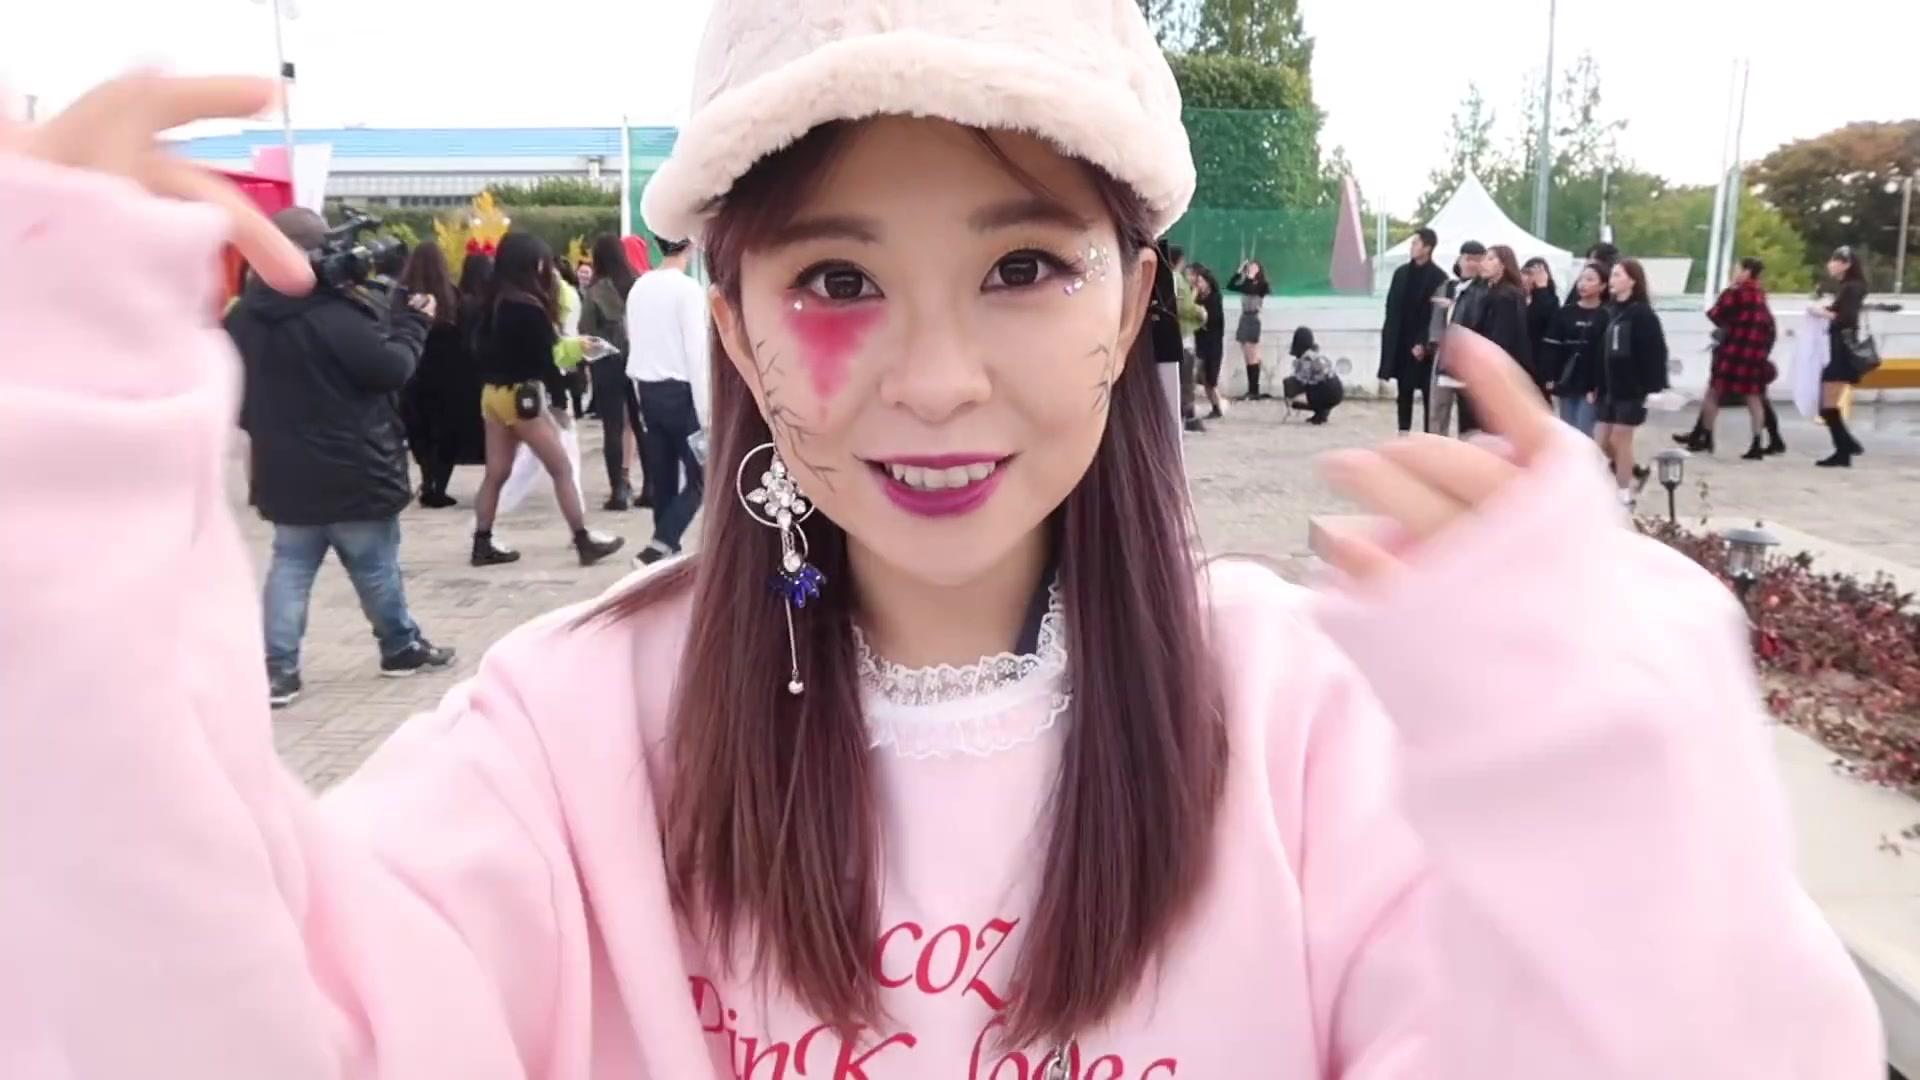 itsjinakim Episode 57: Crazy Halloween Night in Seoul [Itsjinakim]